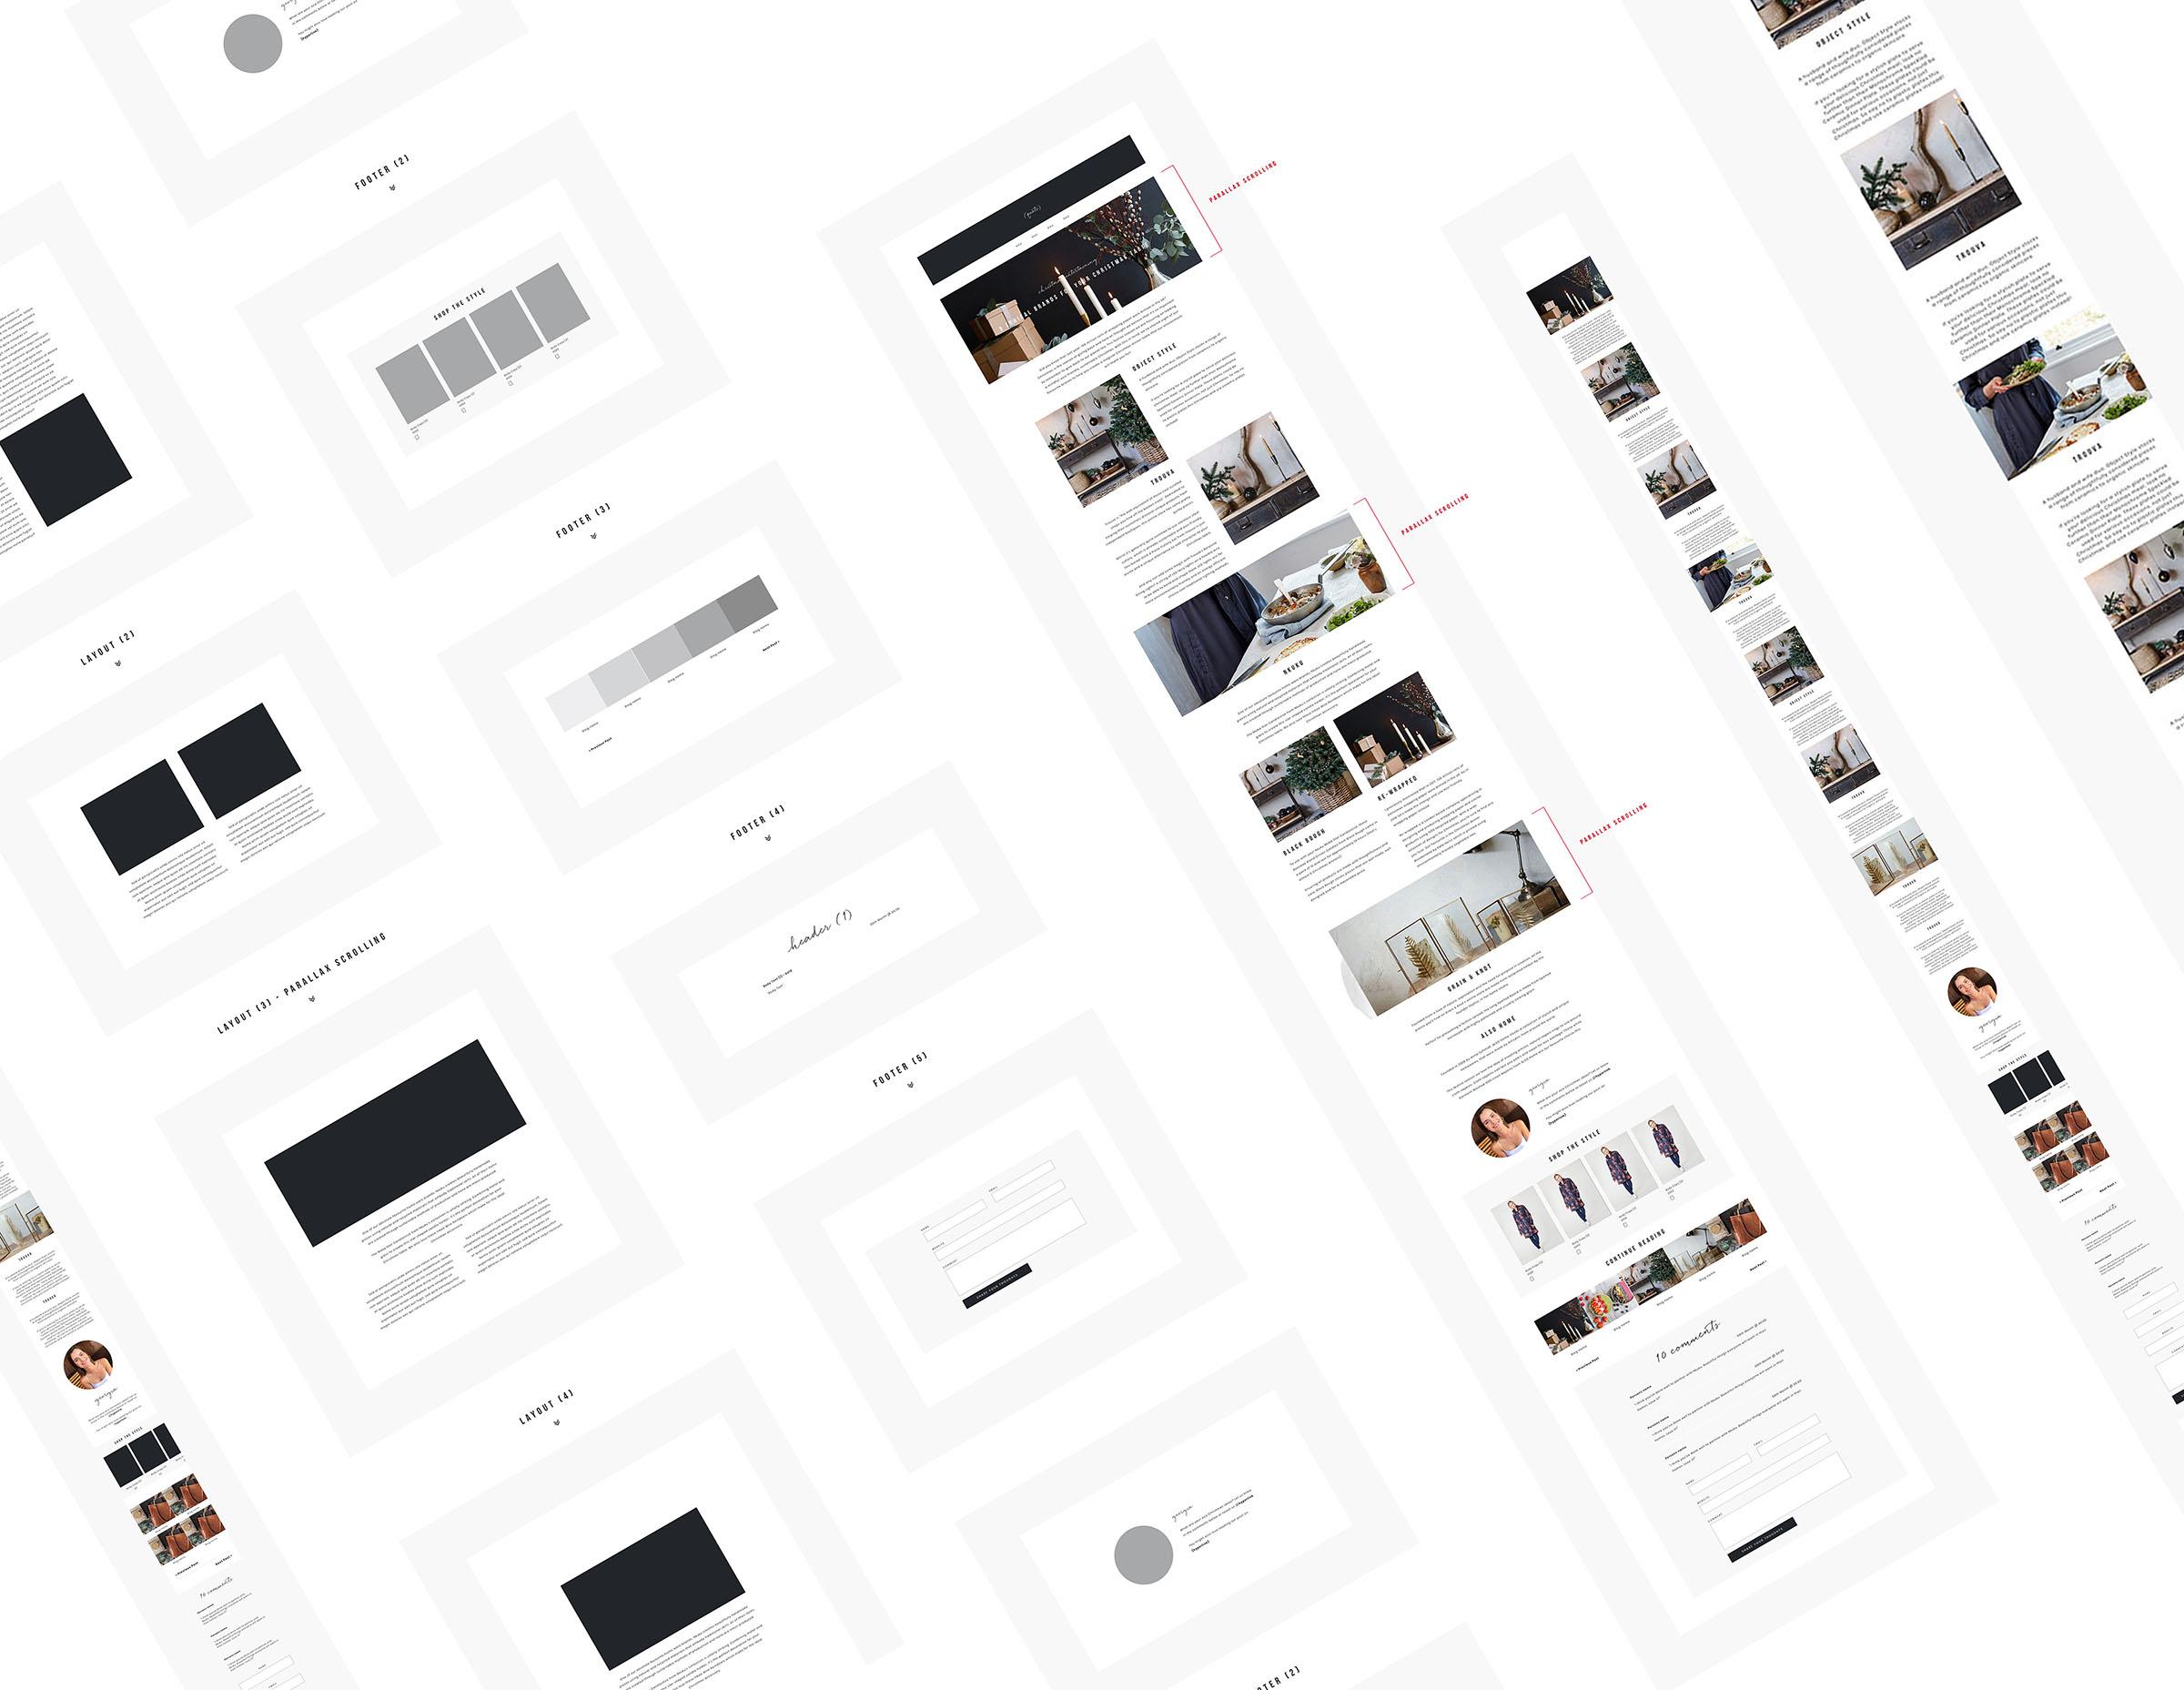 lauren-grace-design-ui-digital-brand-designer-sustainable-thought-fashion-blog-wireframes.jpg